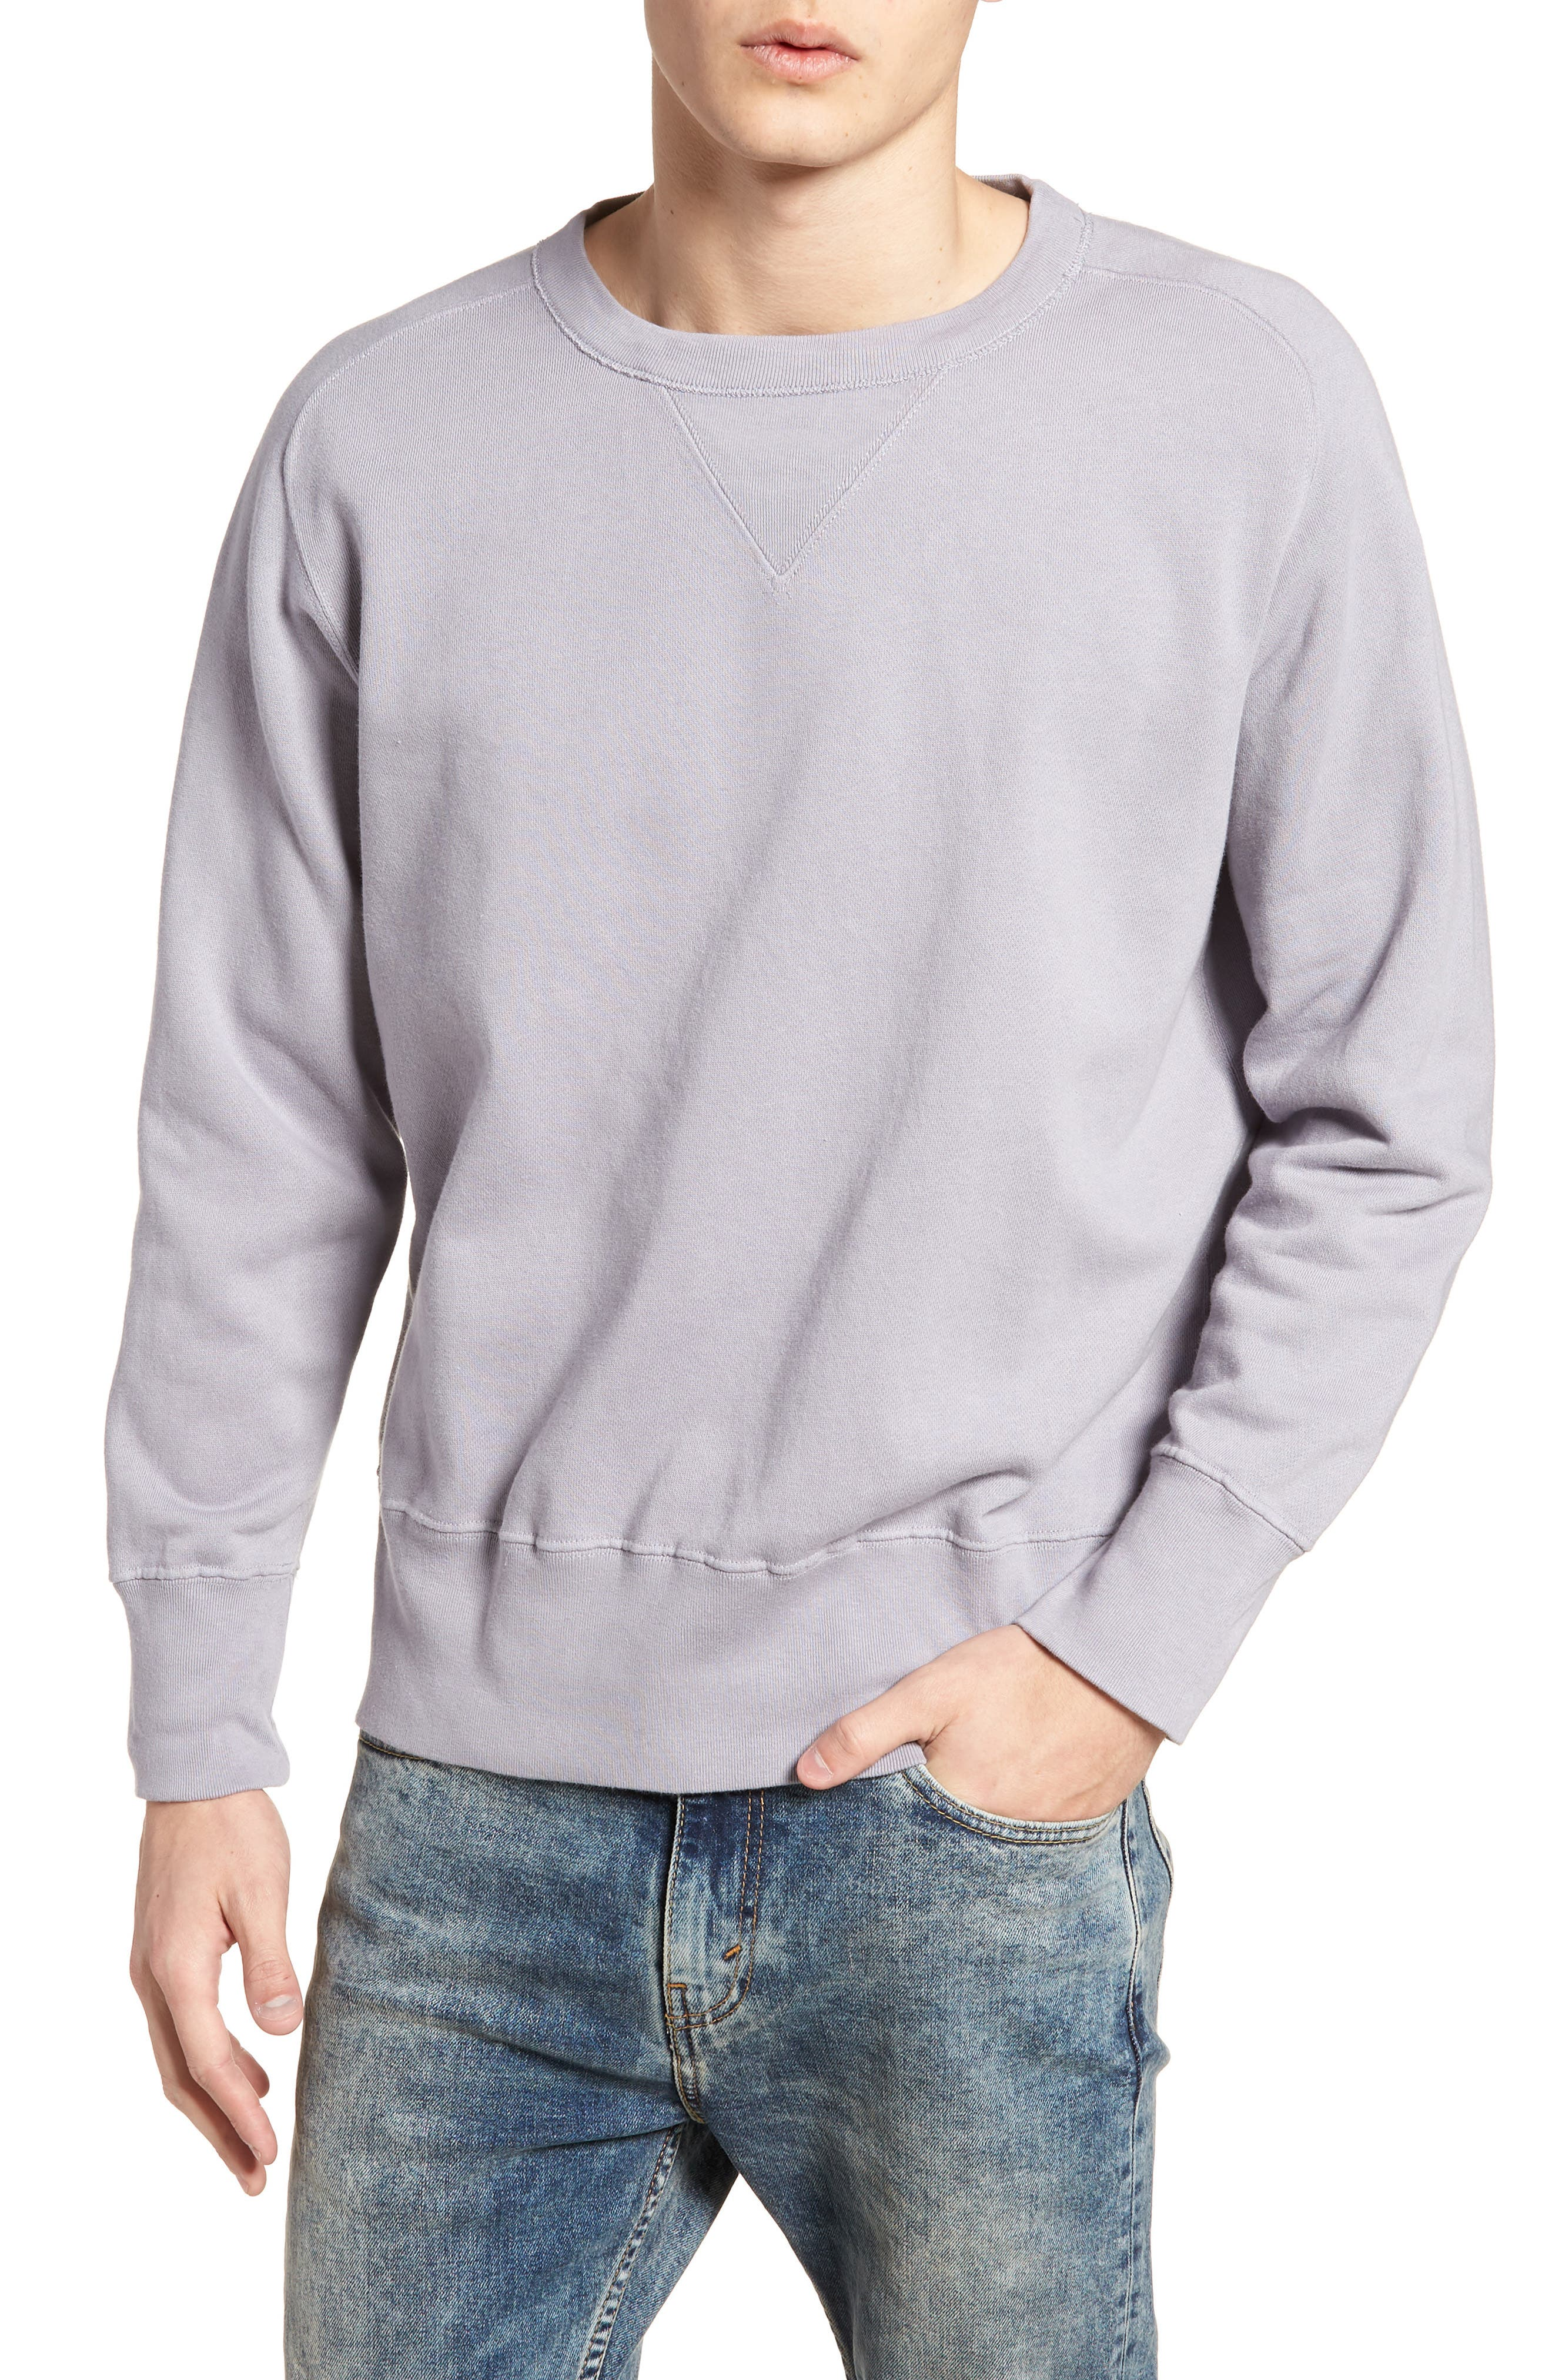 Bay Meadows Sweatshirt,                             Main thumbnail 1, color,                             Quiksilver